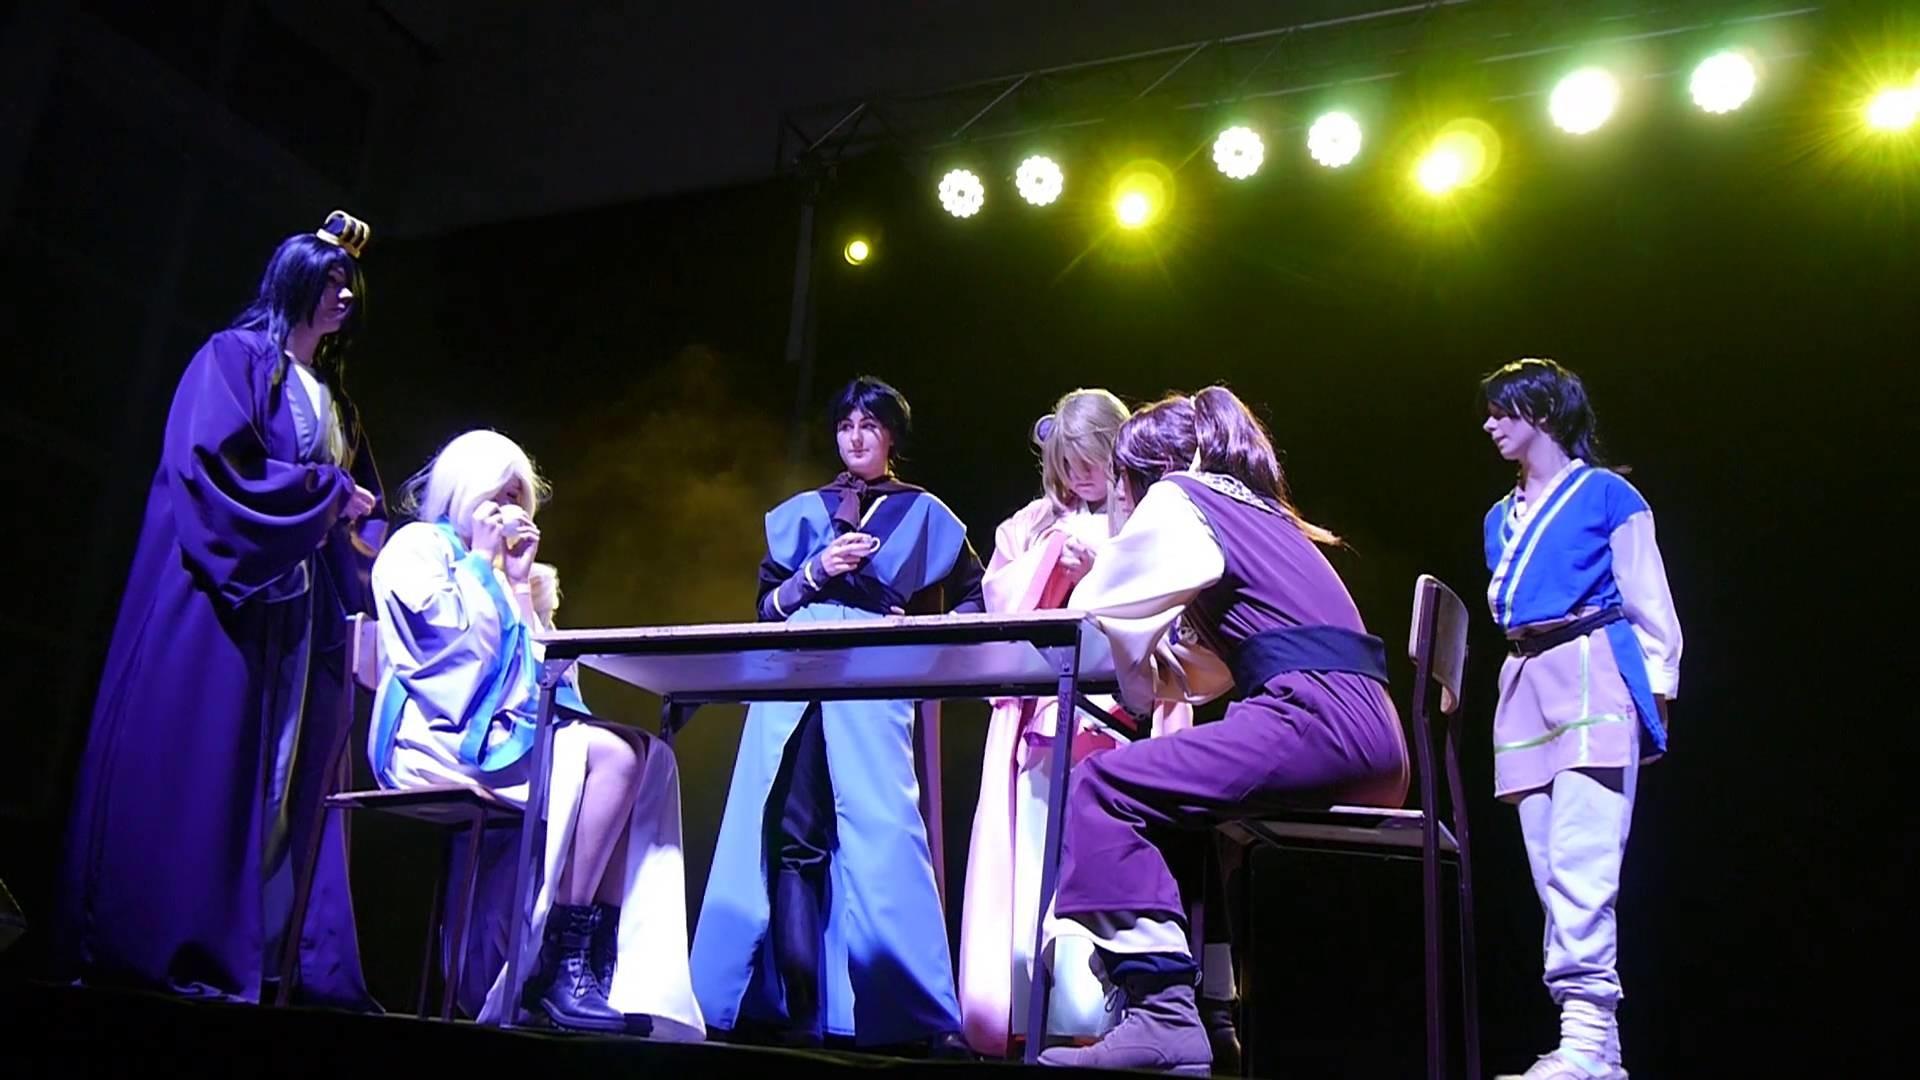 Cosplay Akatsuki no Yona by Andy Frankuu Abu on Japanicon 2015